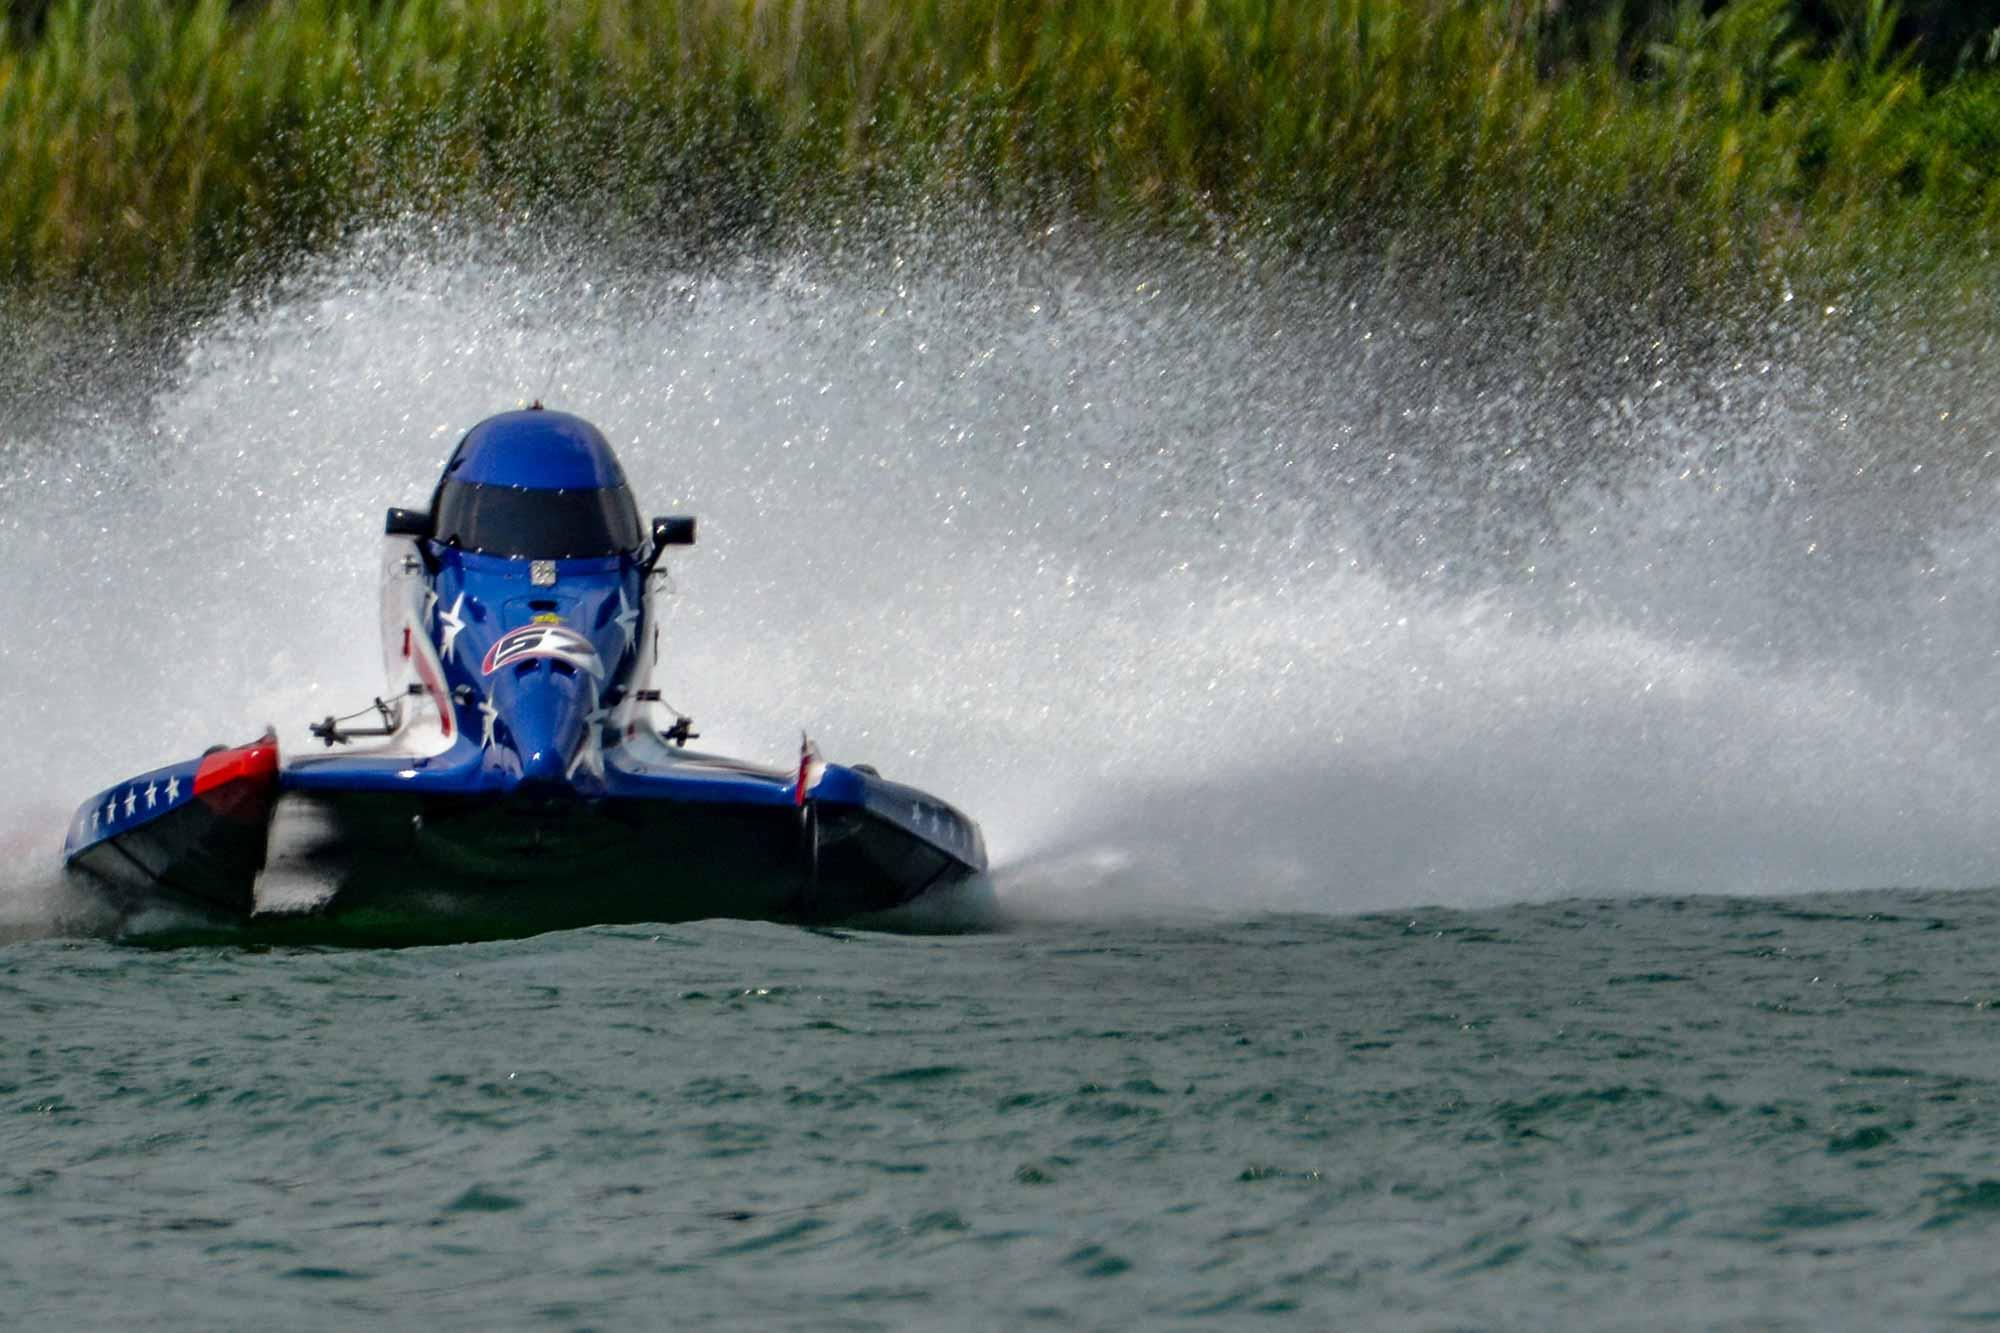 McMurray-Racing-Nashvill-Marine-2021-Springfield-F1-Race-13